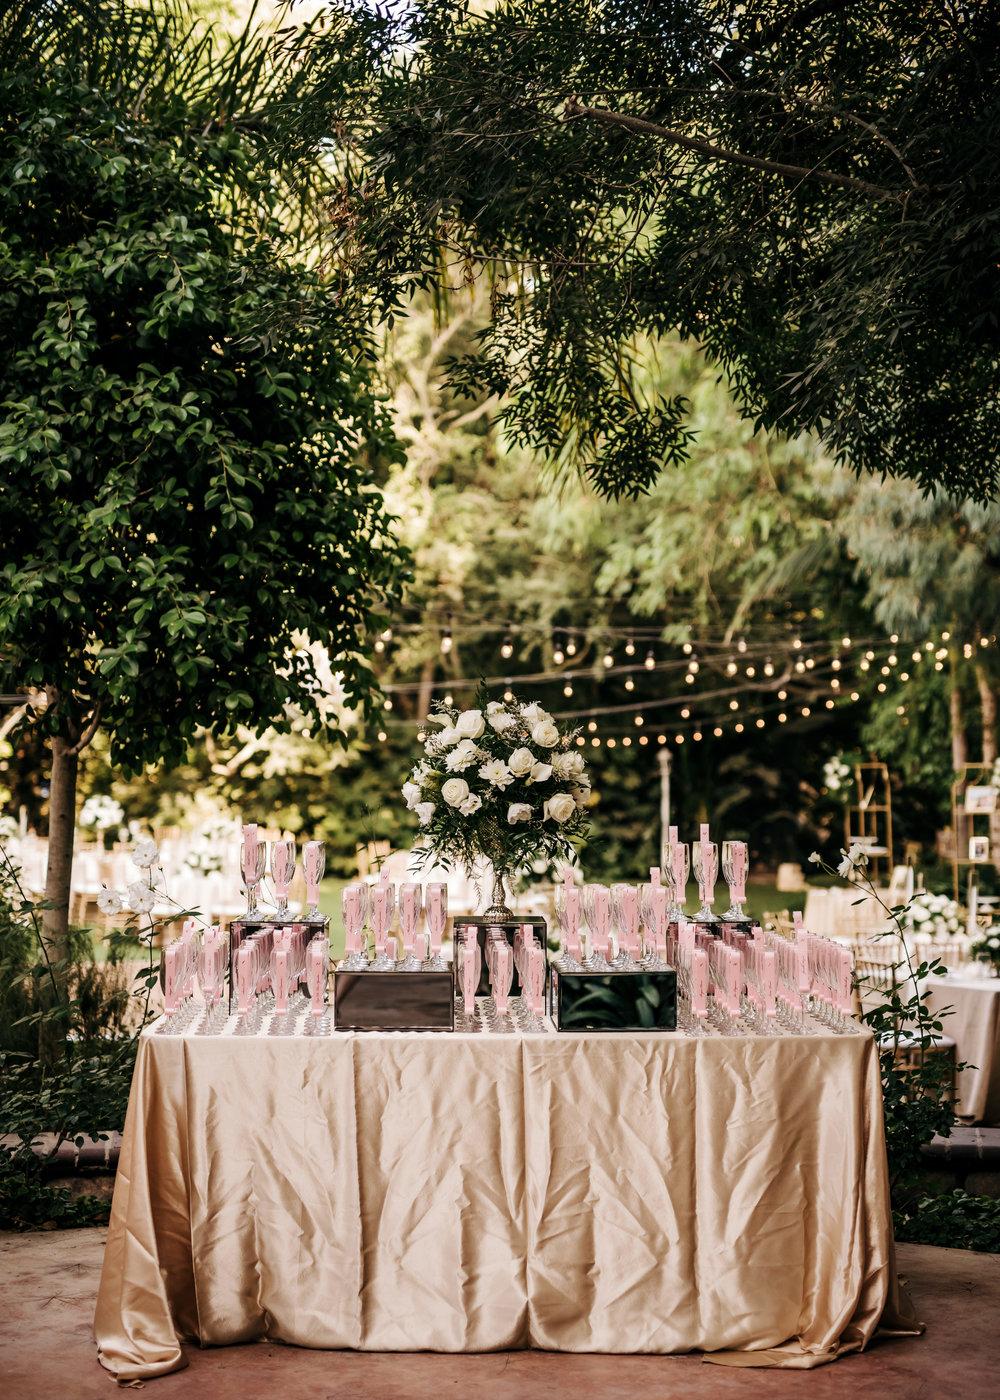 Turchin_20180825_Austinae-Brent-Wedding_385.jpg